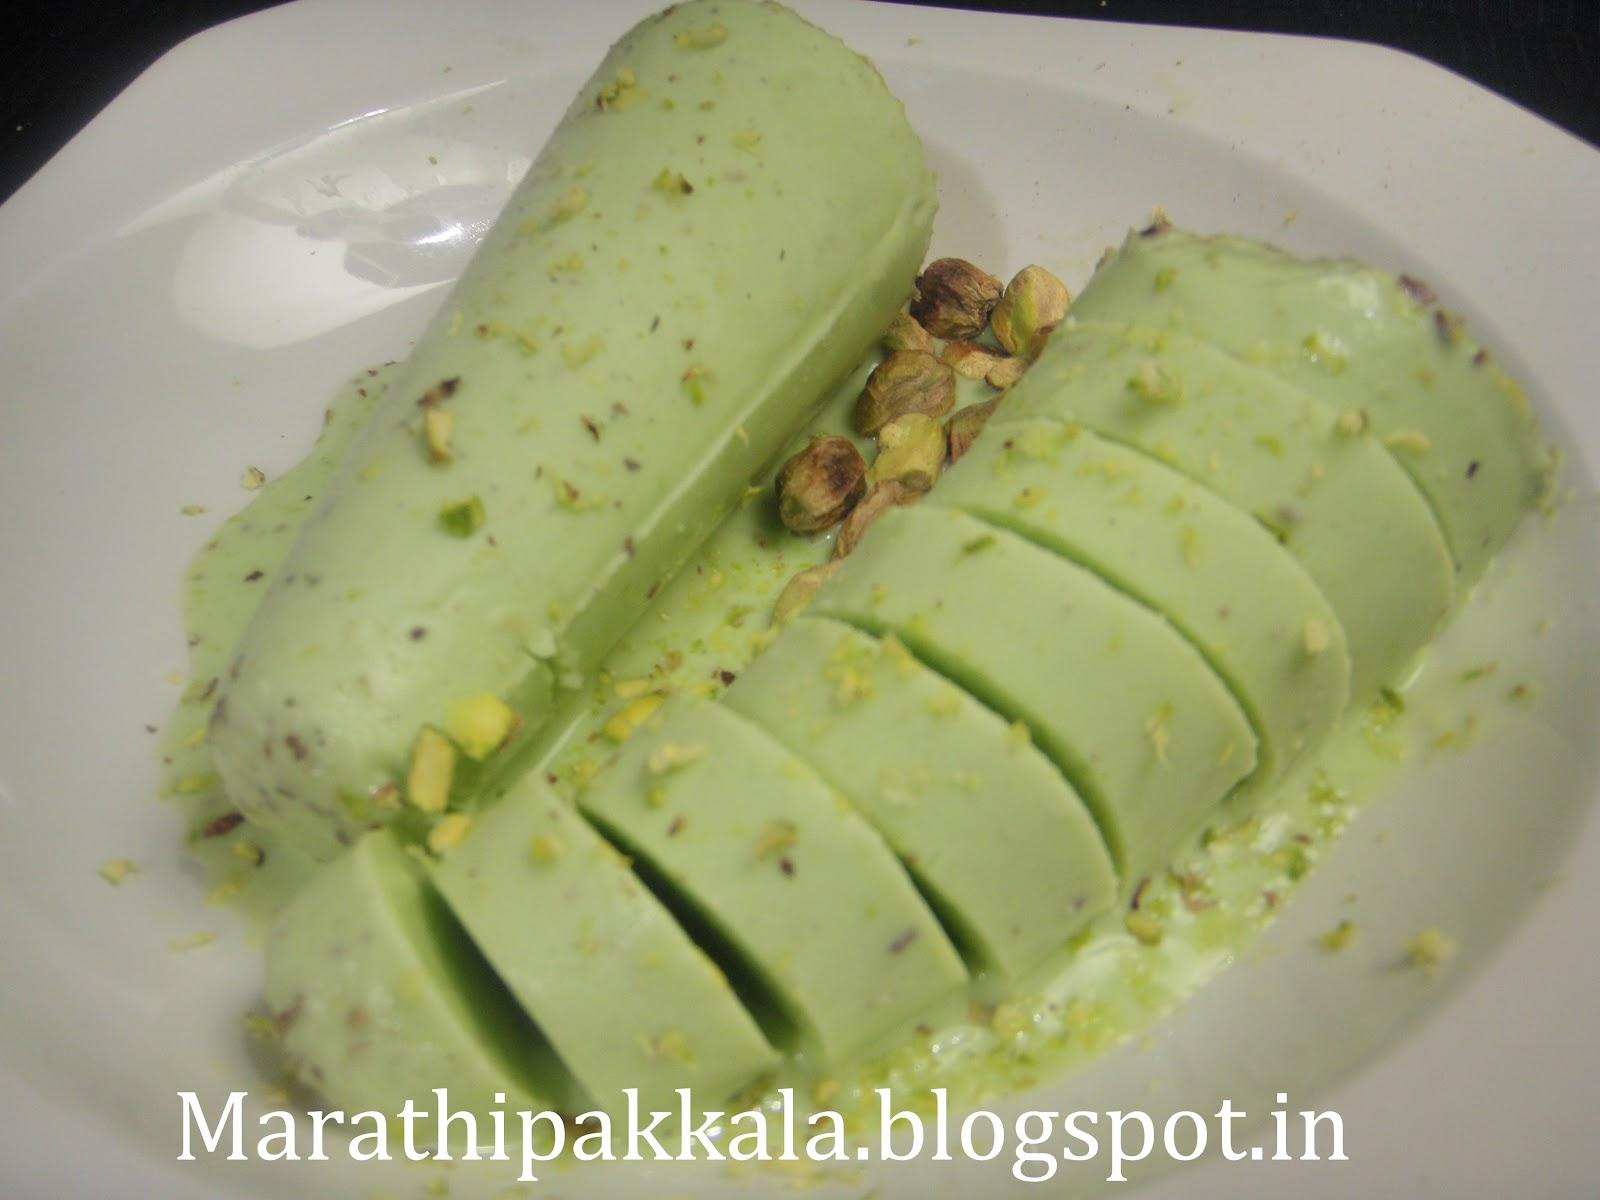 Marathi Pakkala: PISTA KULFI